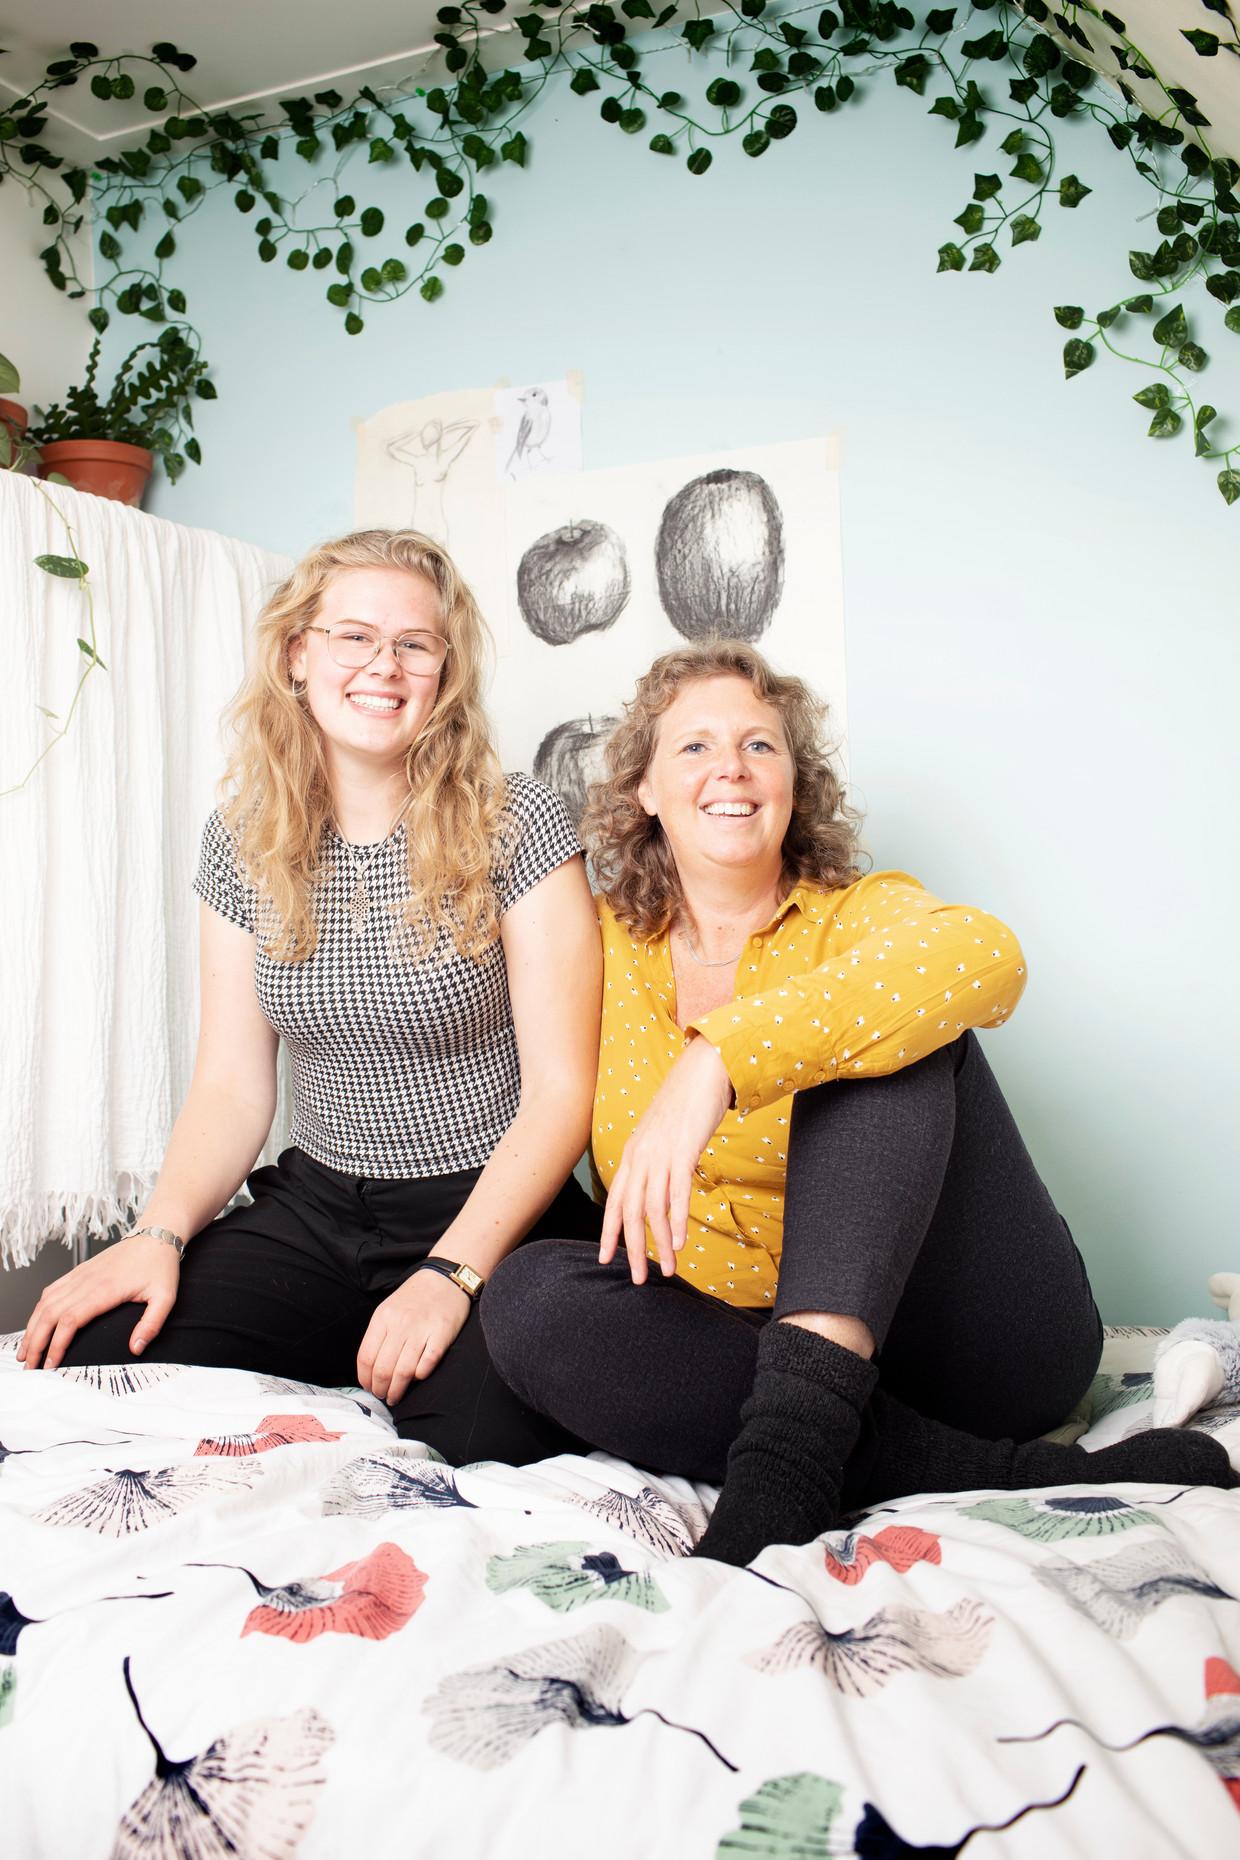 Sarah en Tamara. Beeld Harmen de Jong